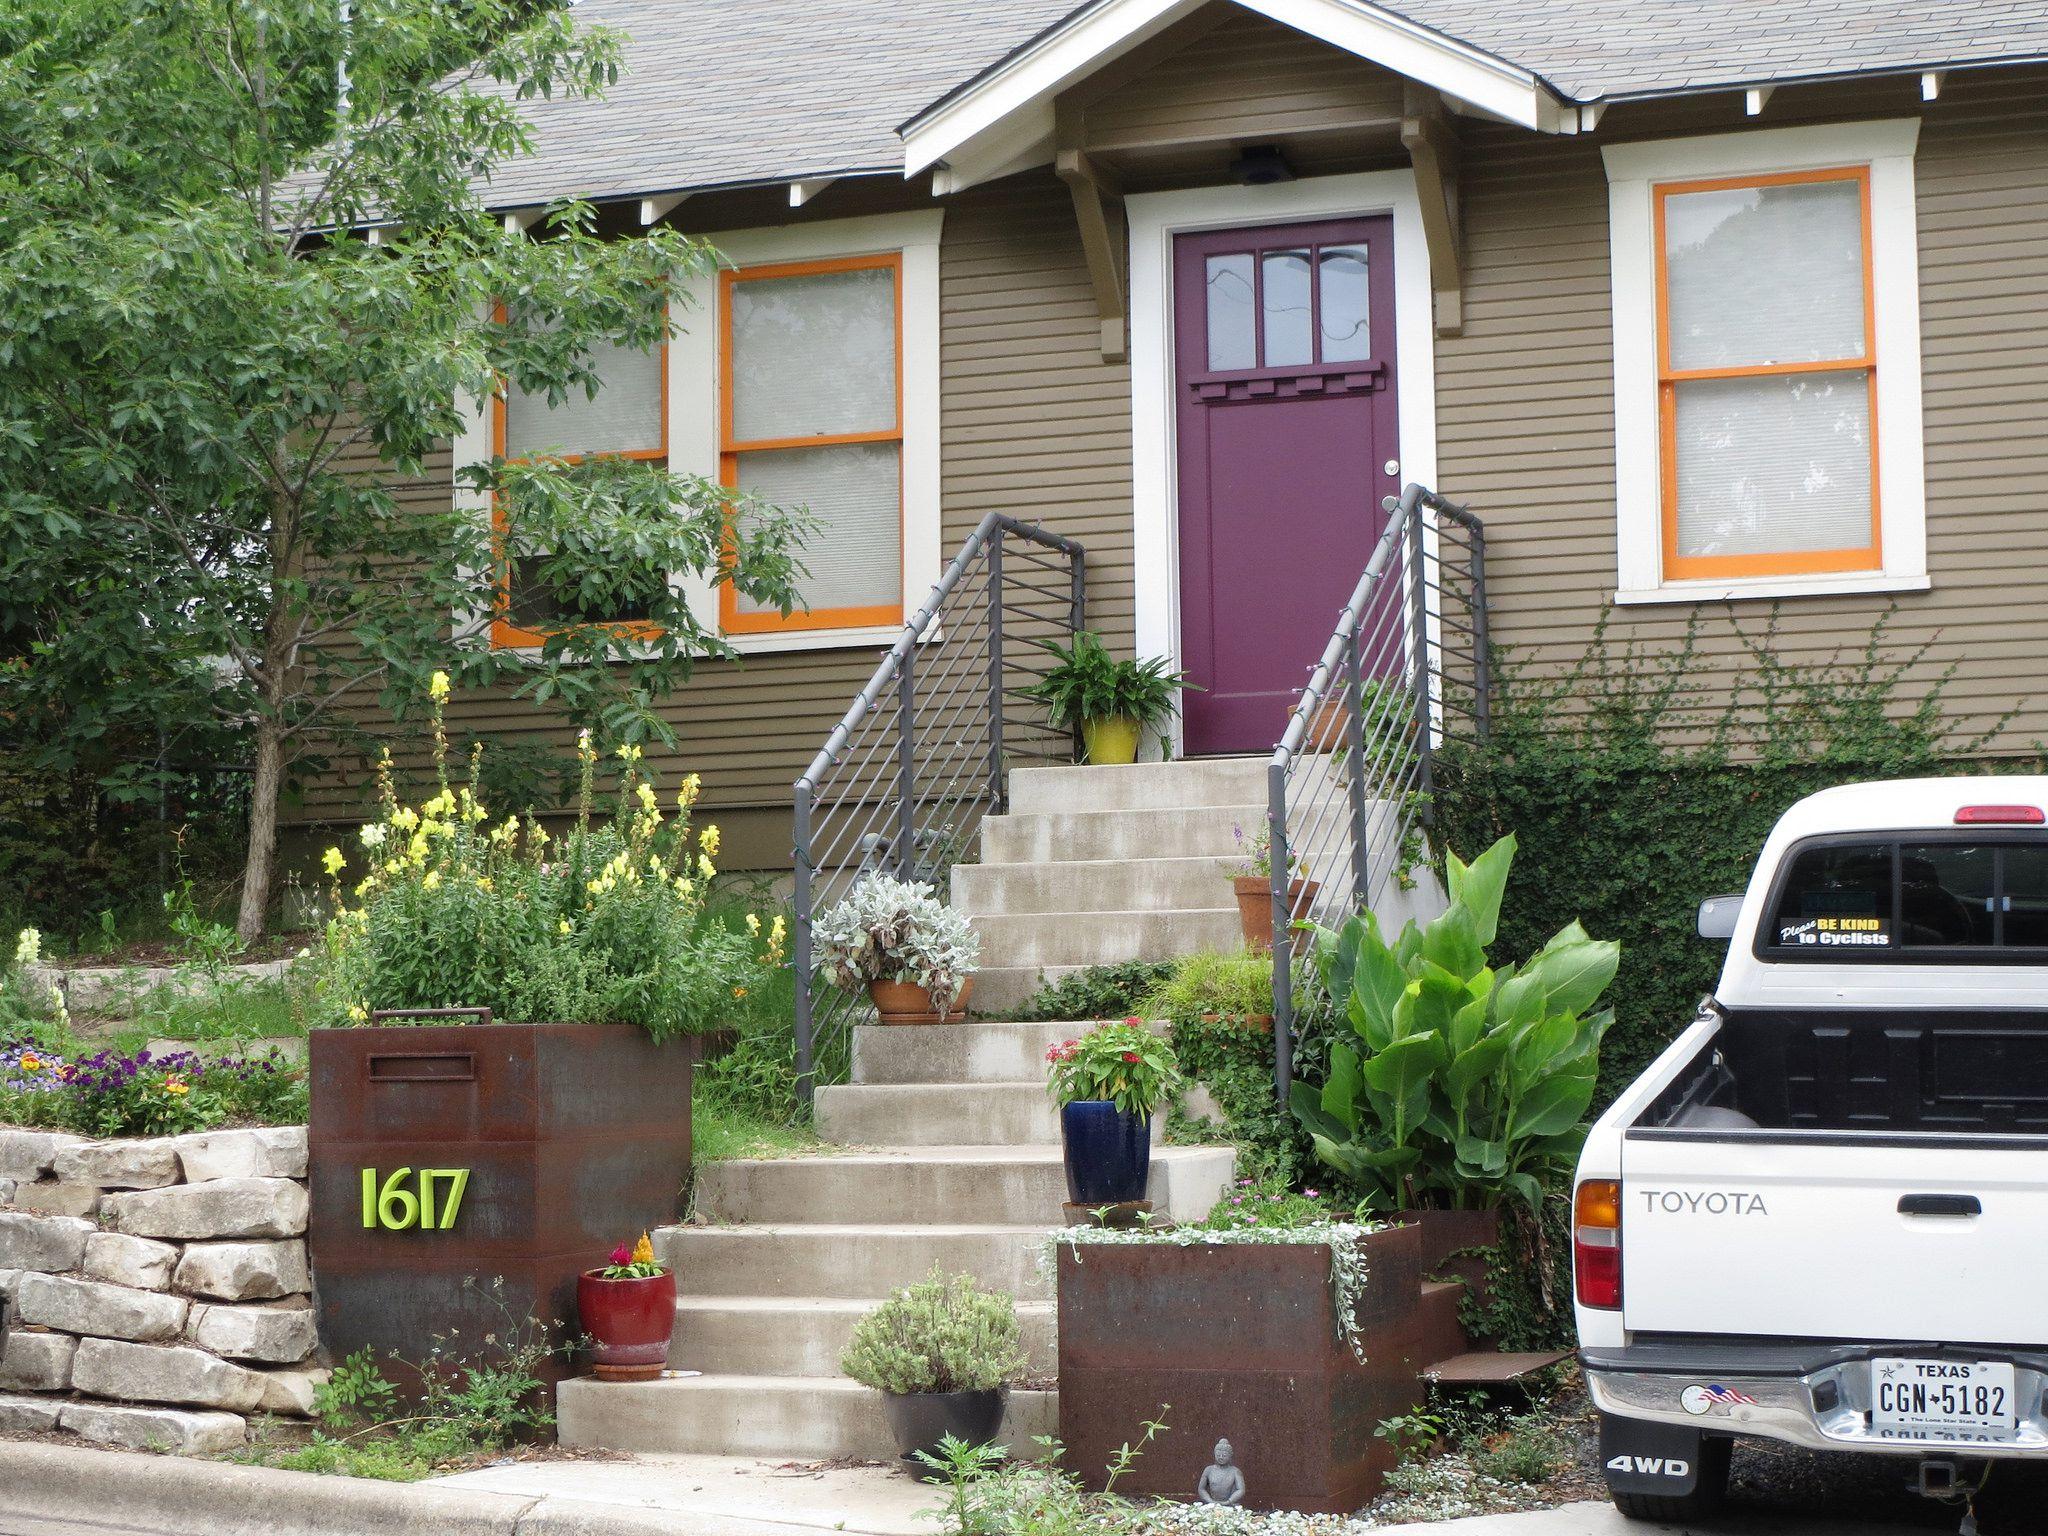 Funky home in the Clarksville neighborhood